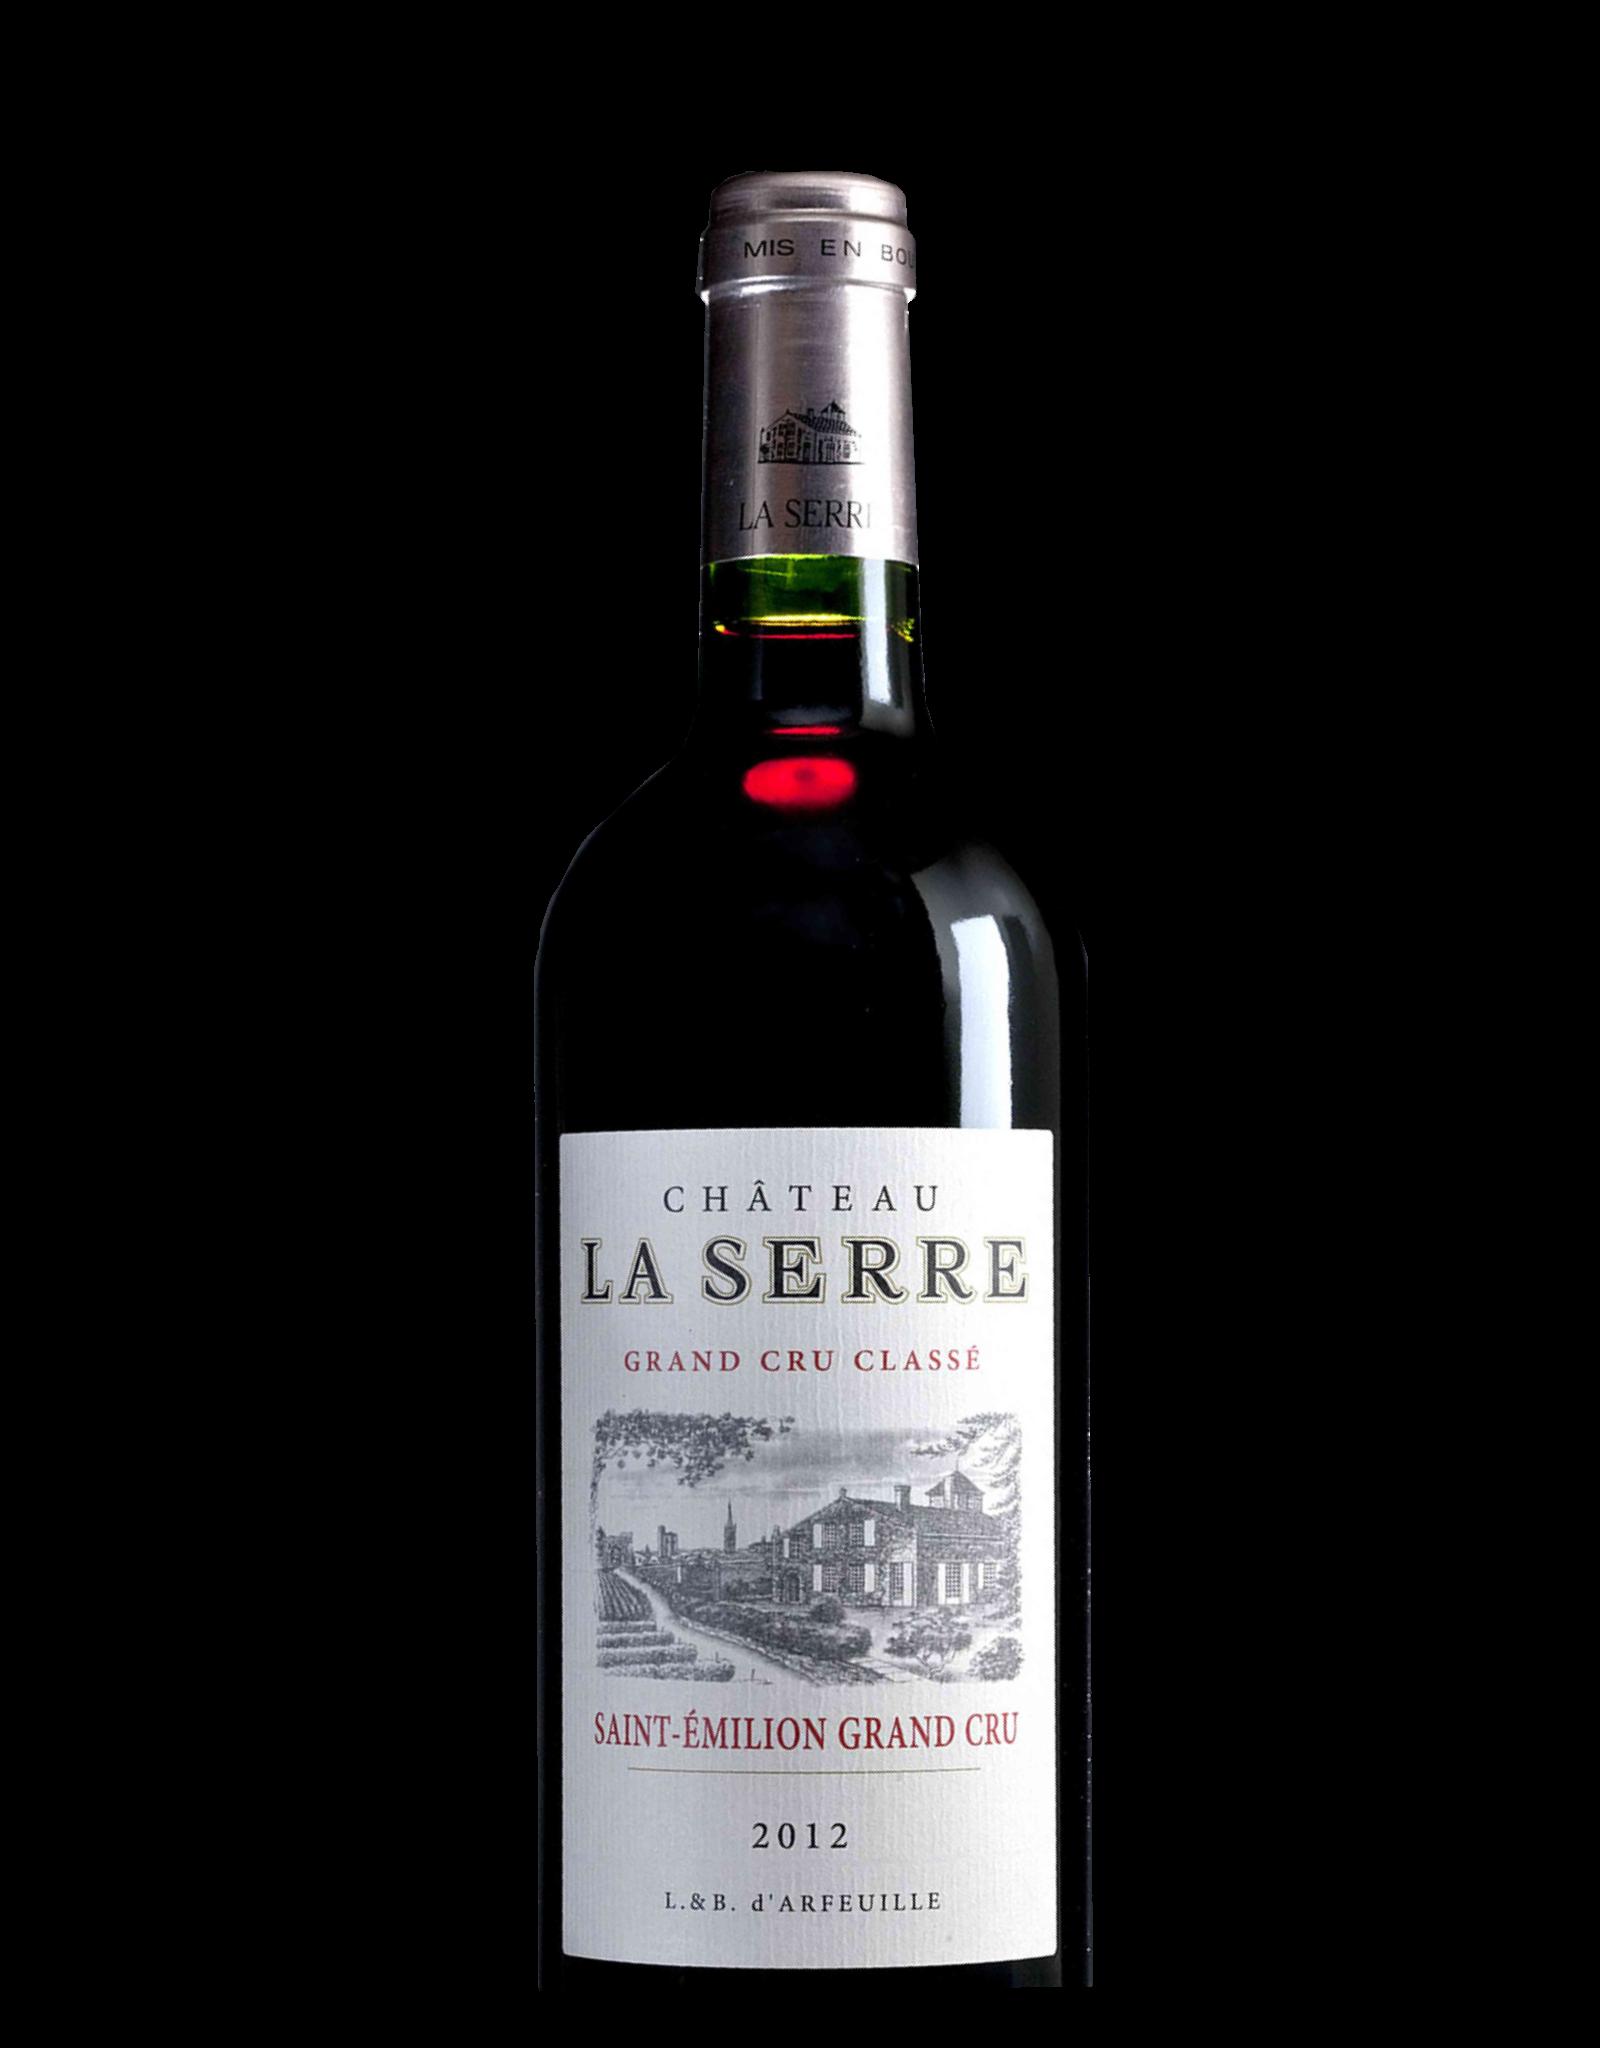 Château La Serre Château La Serre 2017 - St.Emilion